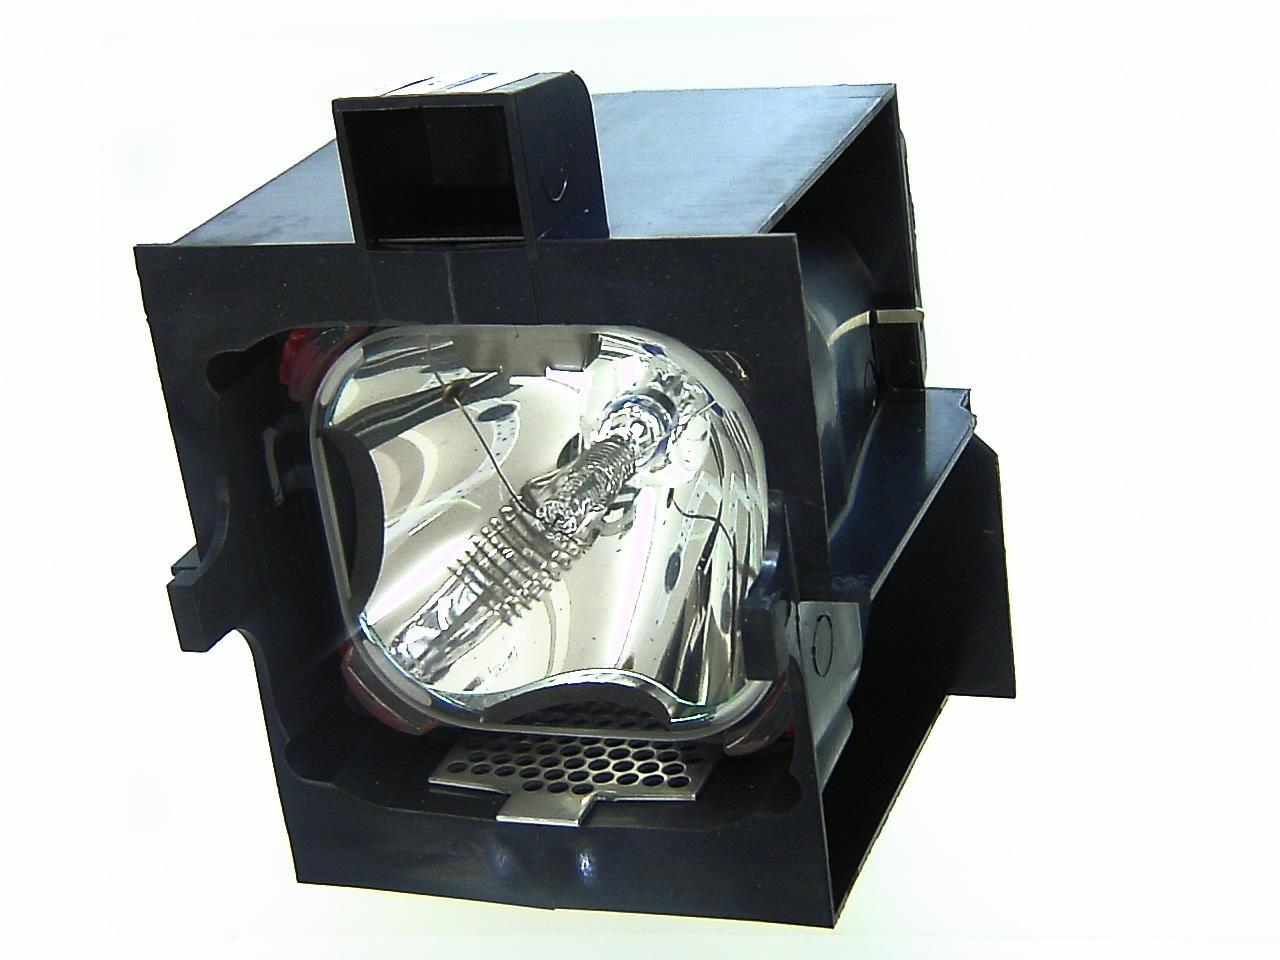 Original Simple Lámpara For BARCO ID R600 (single) Proyector.